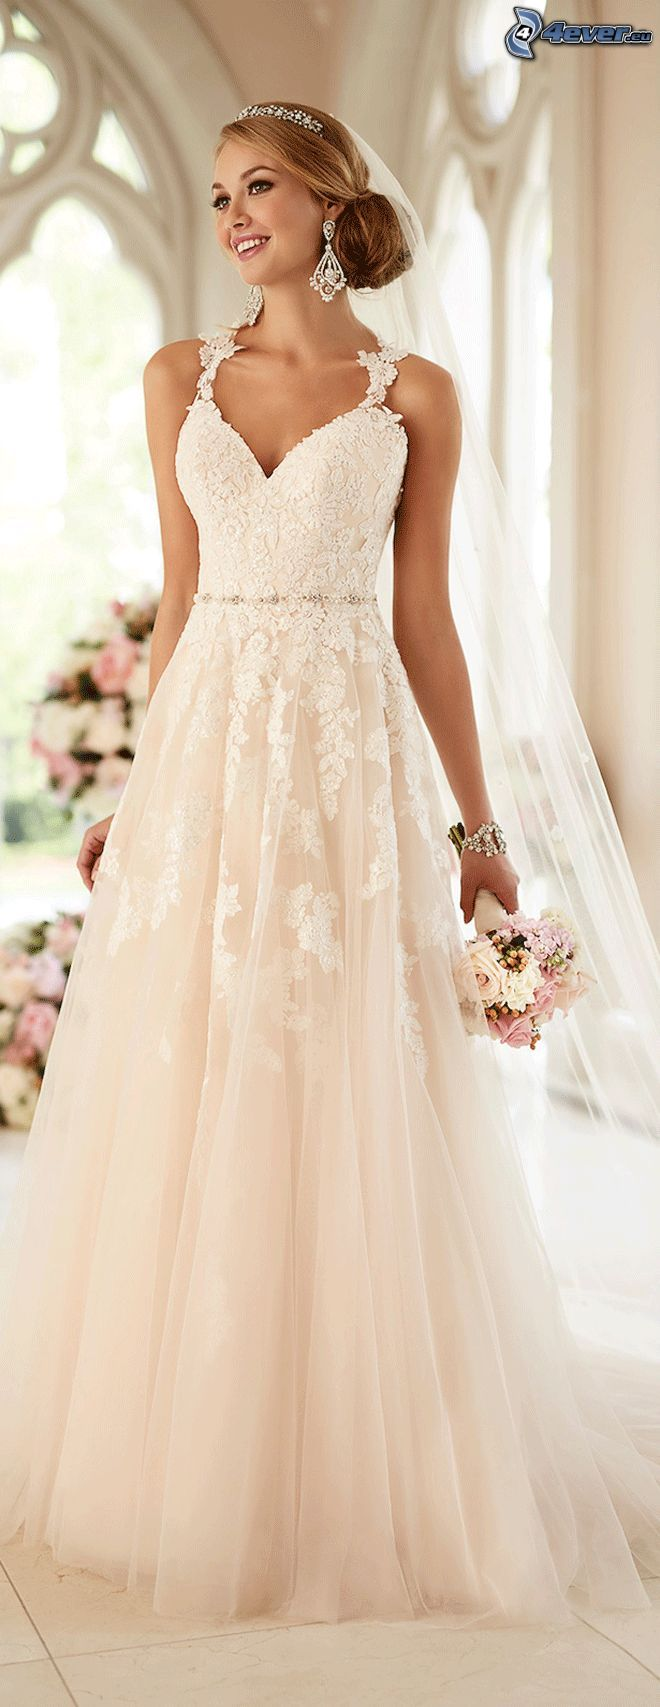 wedding dress, bride, wedding bouquet, smile